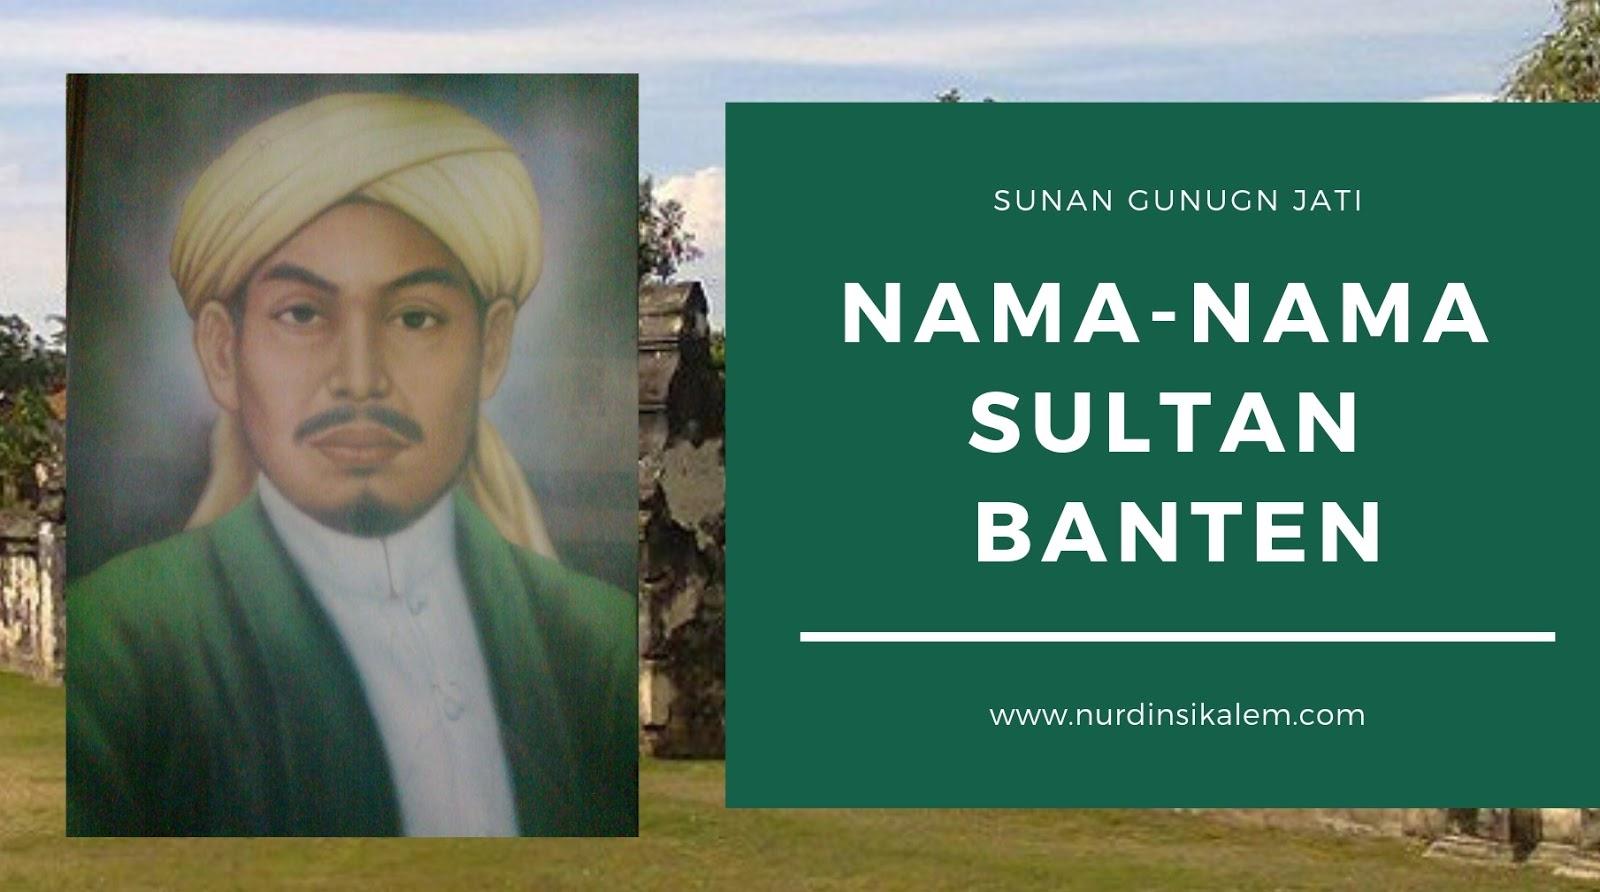 Mengenal nama-nama sultan banten